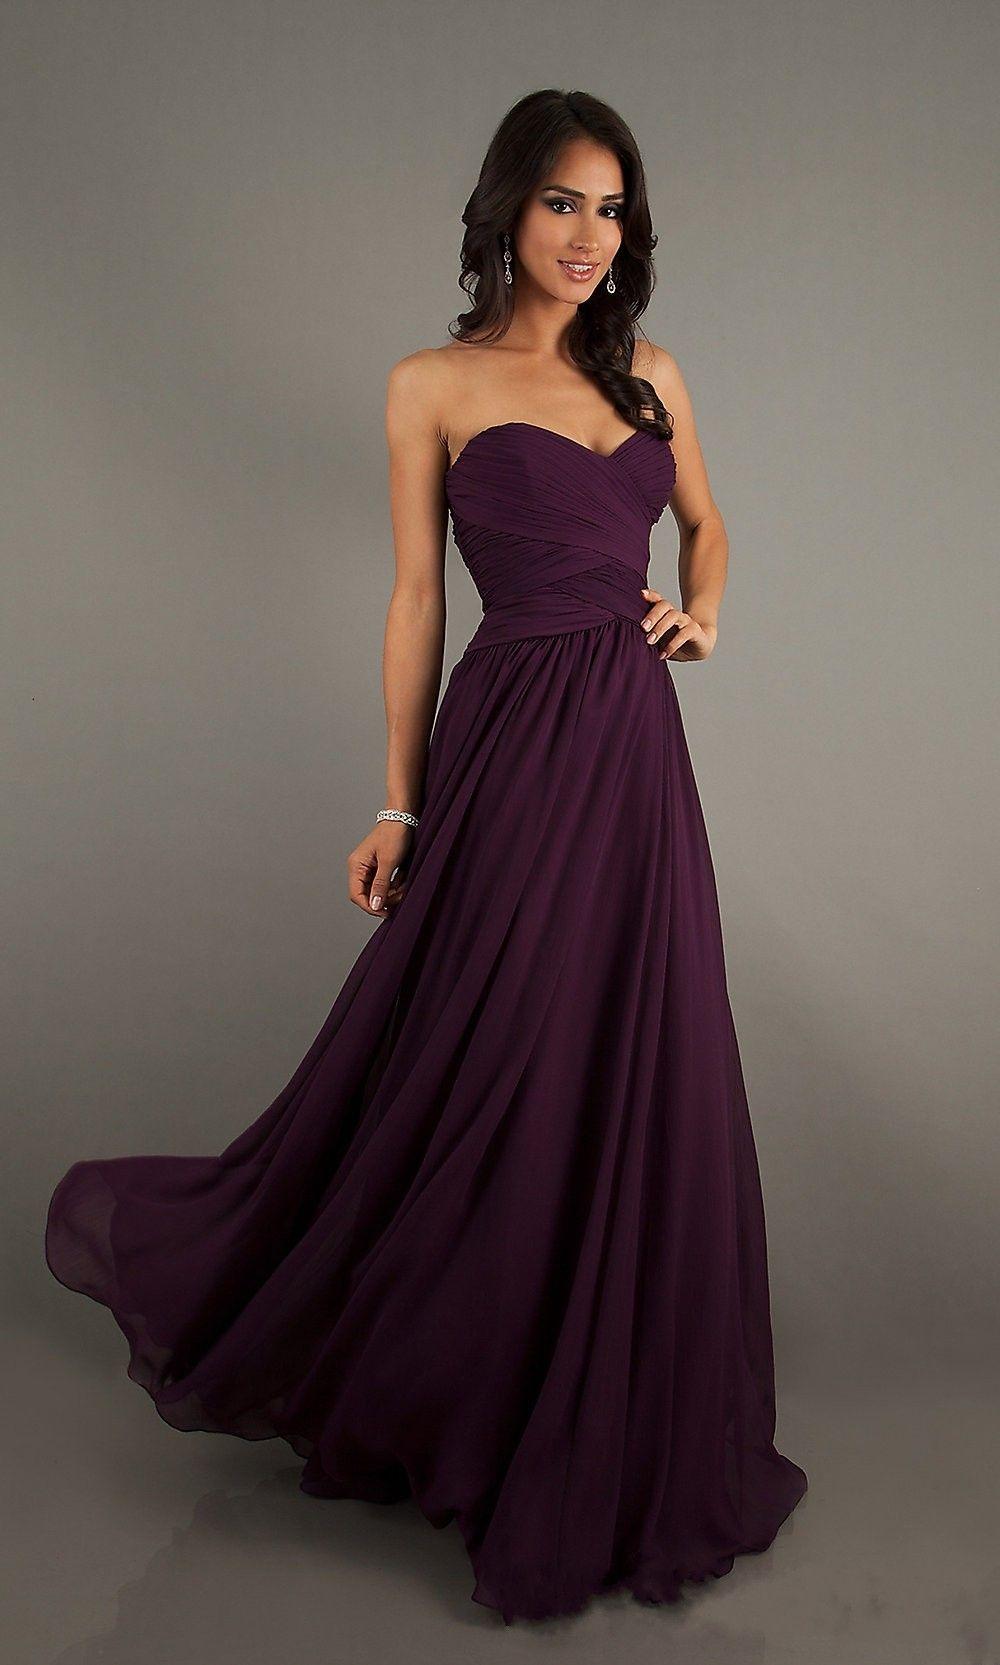 Aline sleeveless floor length sweetheart chiffon grape bridesmaid